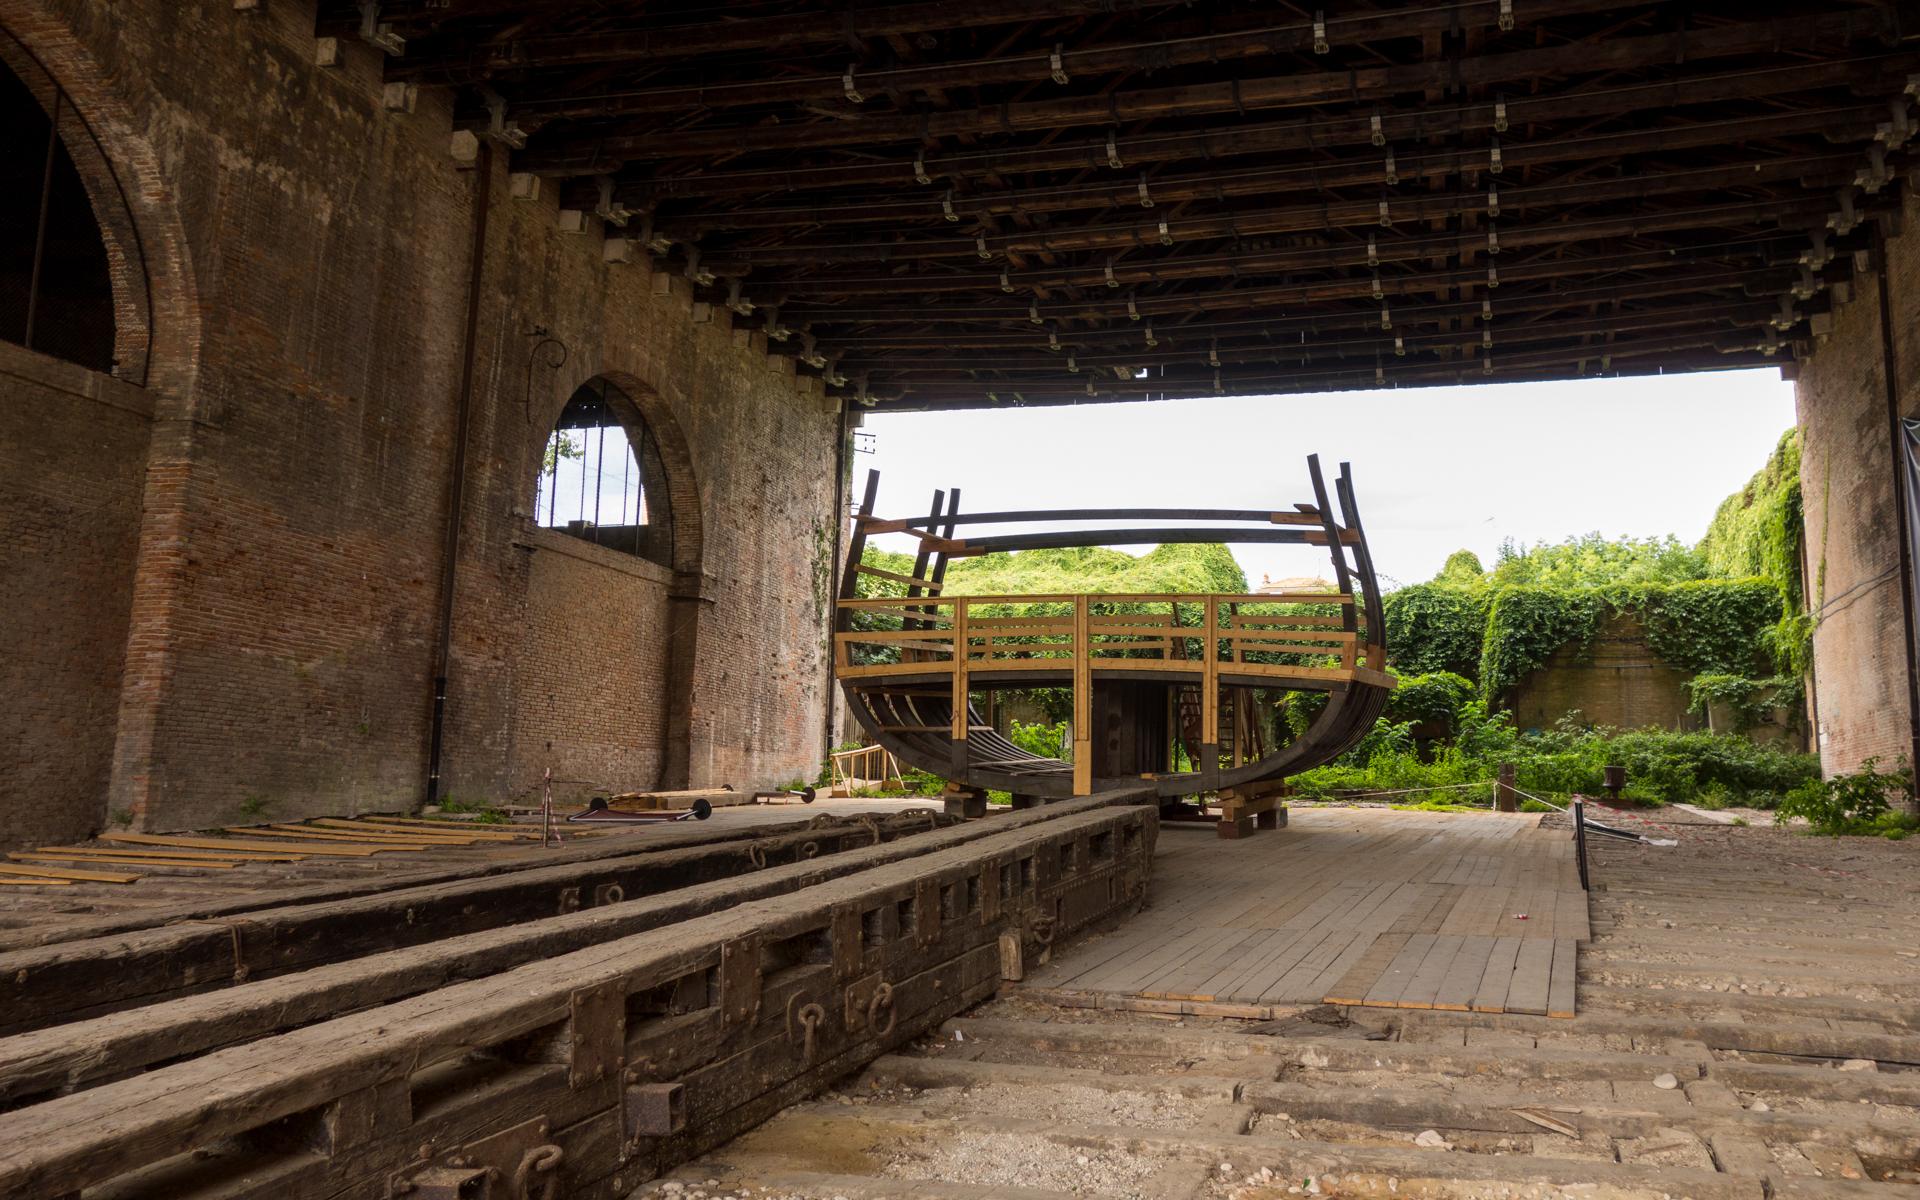 Free Images : wood, track, bridge, building, transport, ruins ...